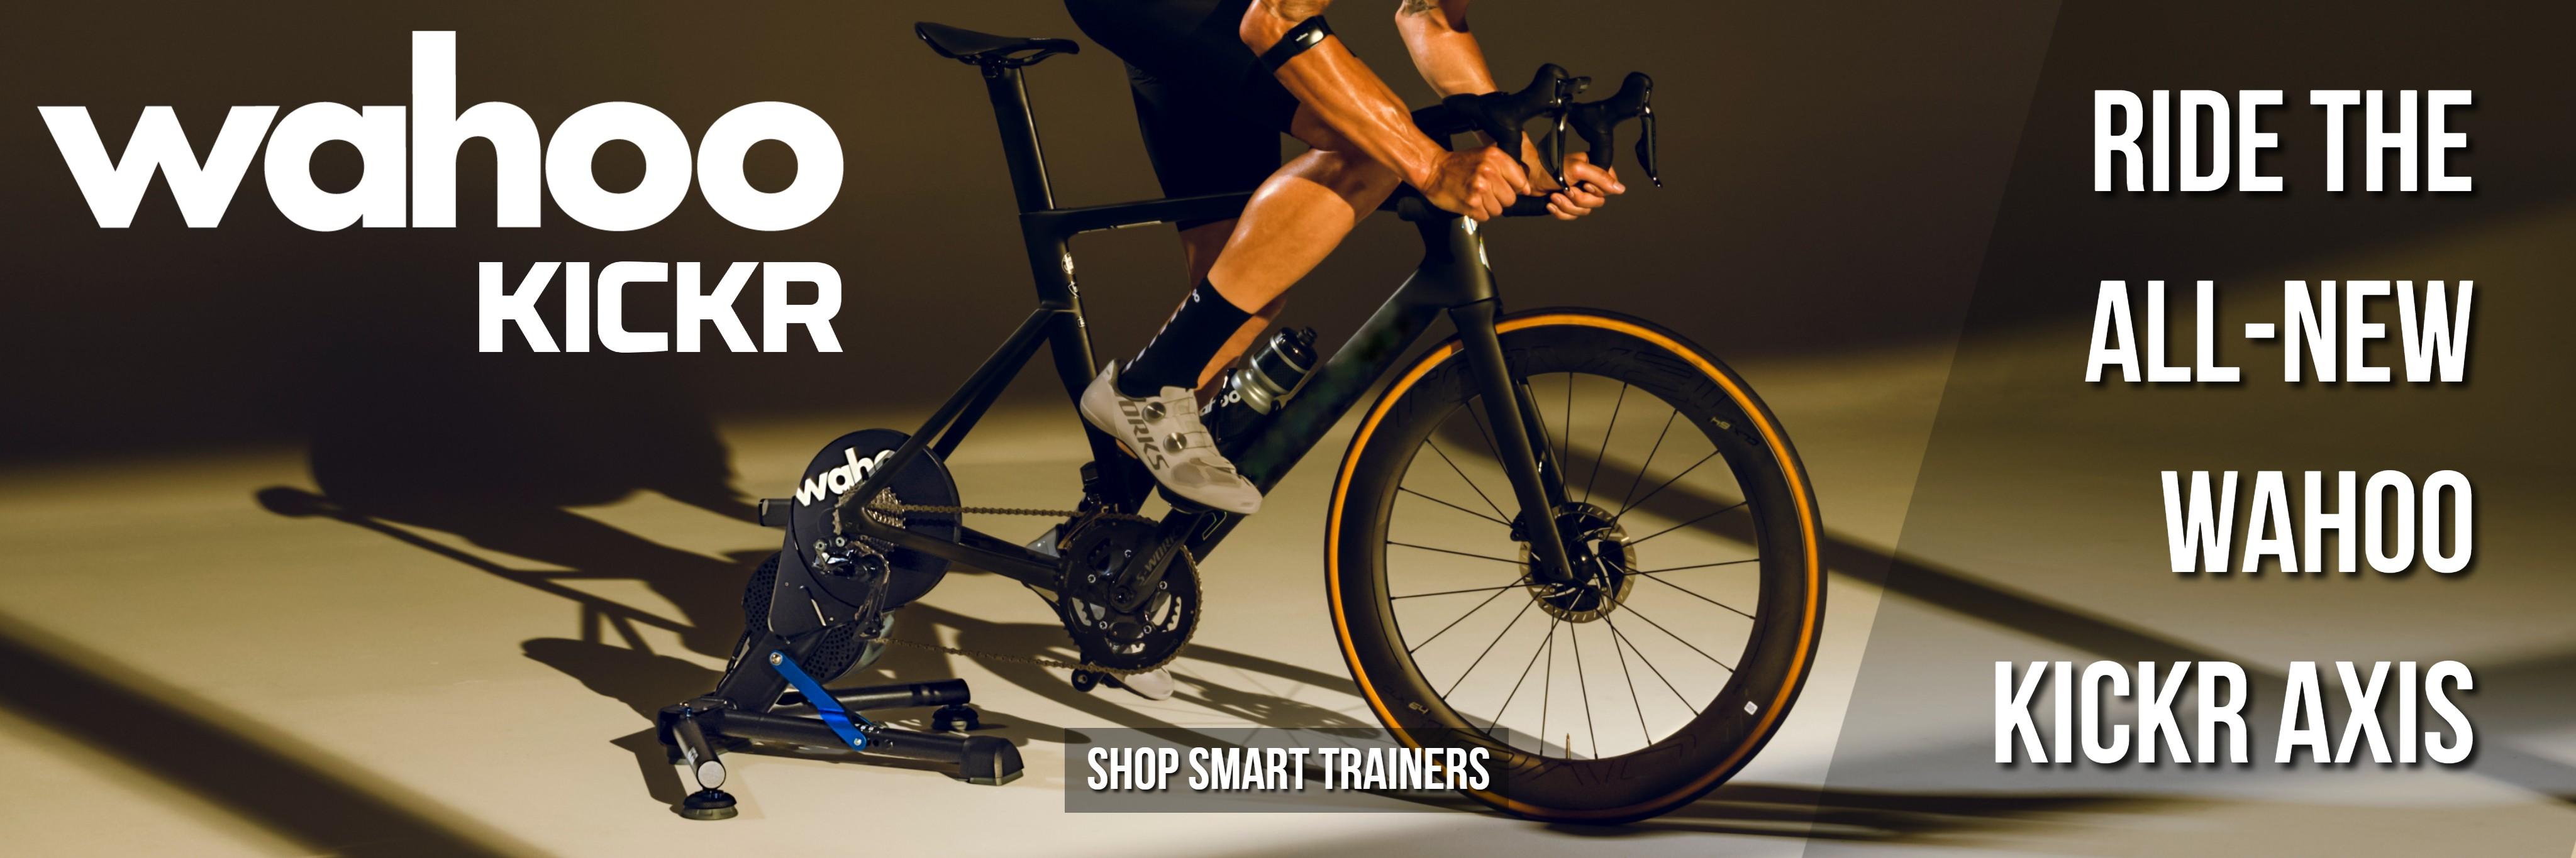 Shop Smart Trainers